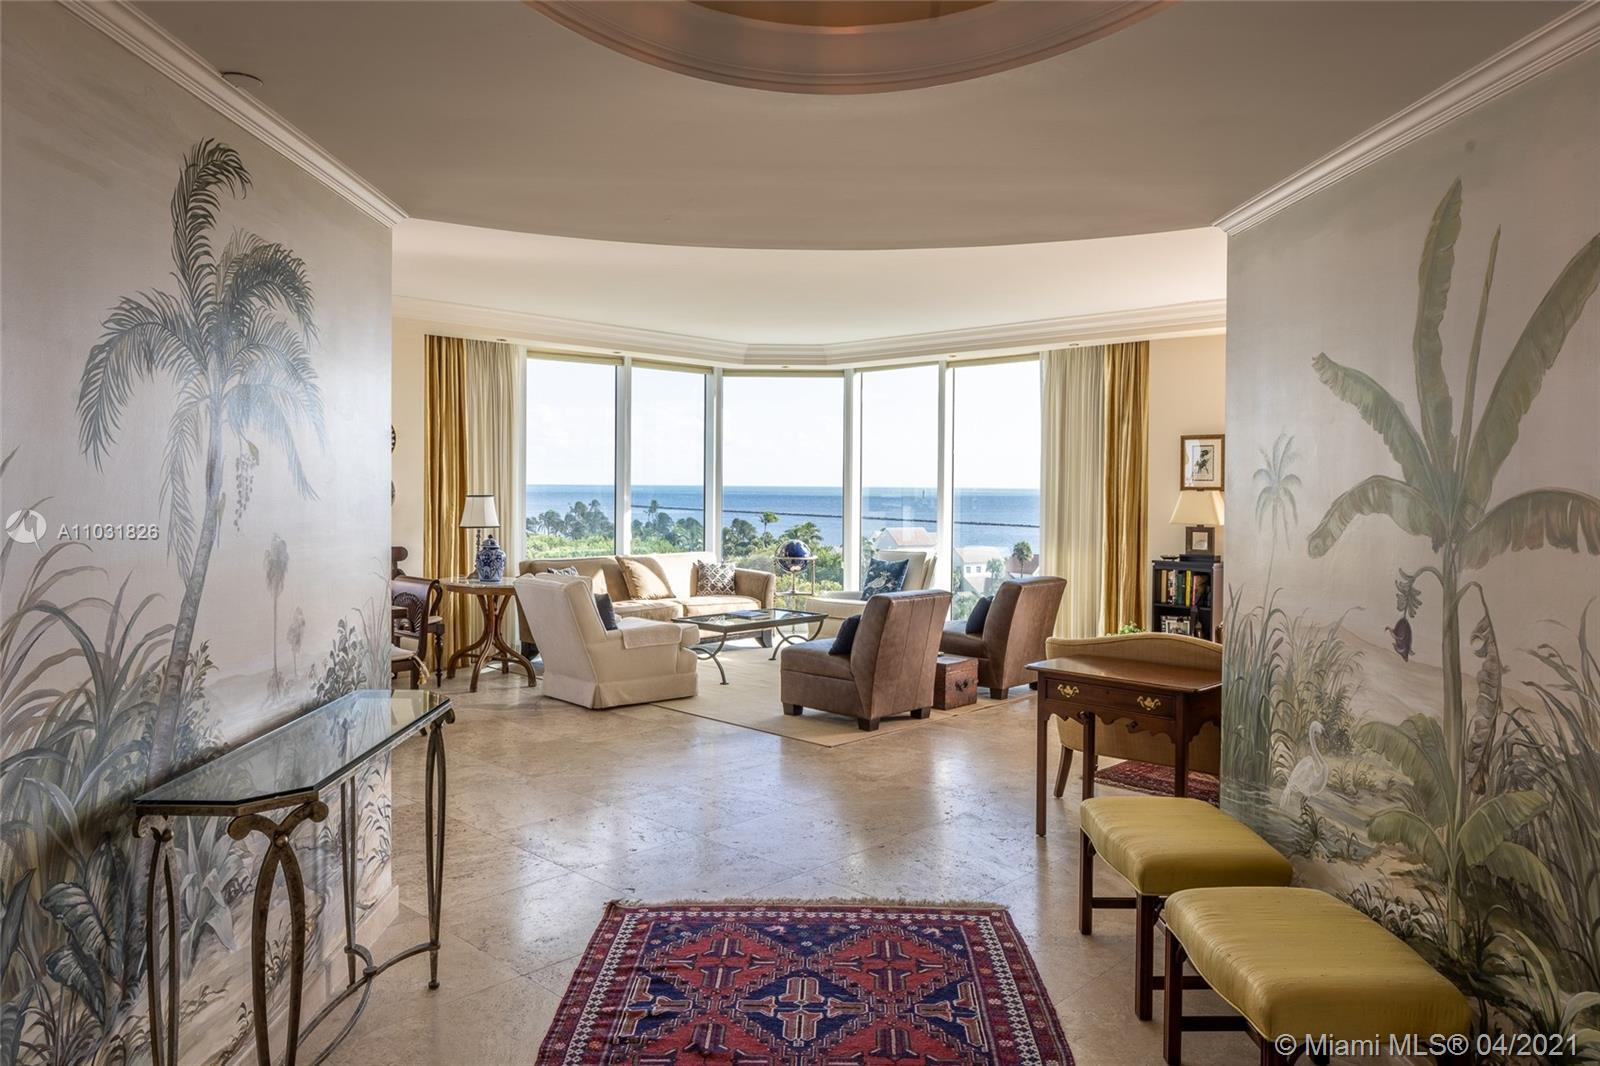 Rare 3-bedroom, large floorplan within walking steps to the beach at Miami Beach's iconic Portofino